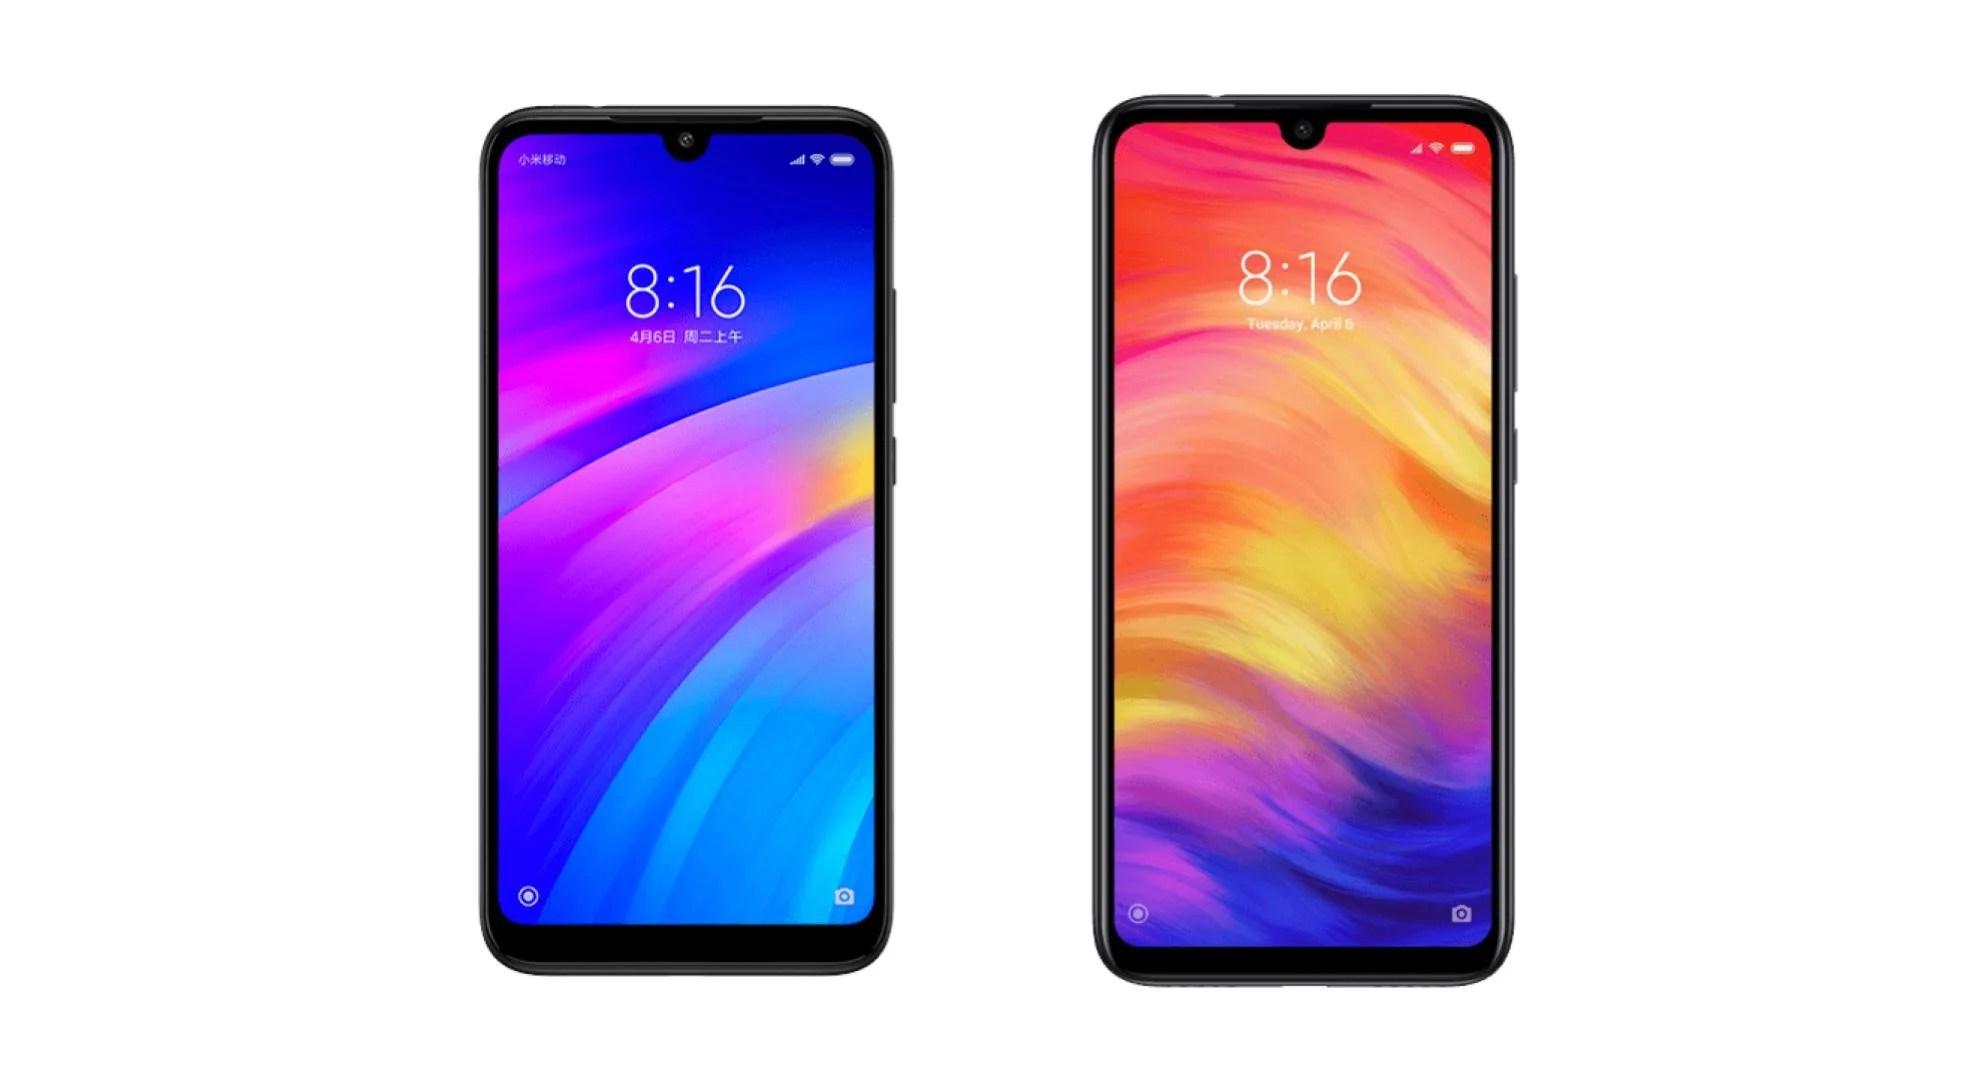 🔥 Bon plan Xiaomi : 90 euros pour le Redmi 7 et 153 euros pour le Redmi Note 7